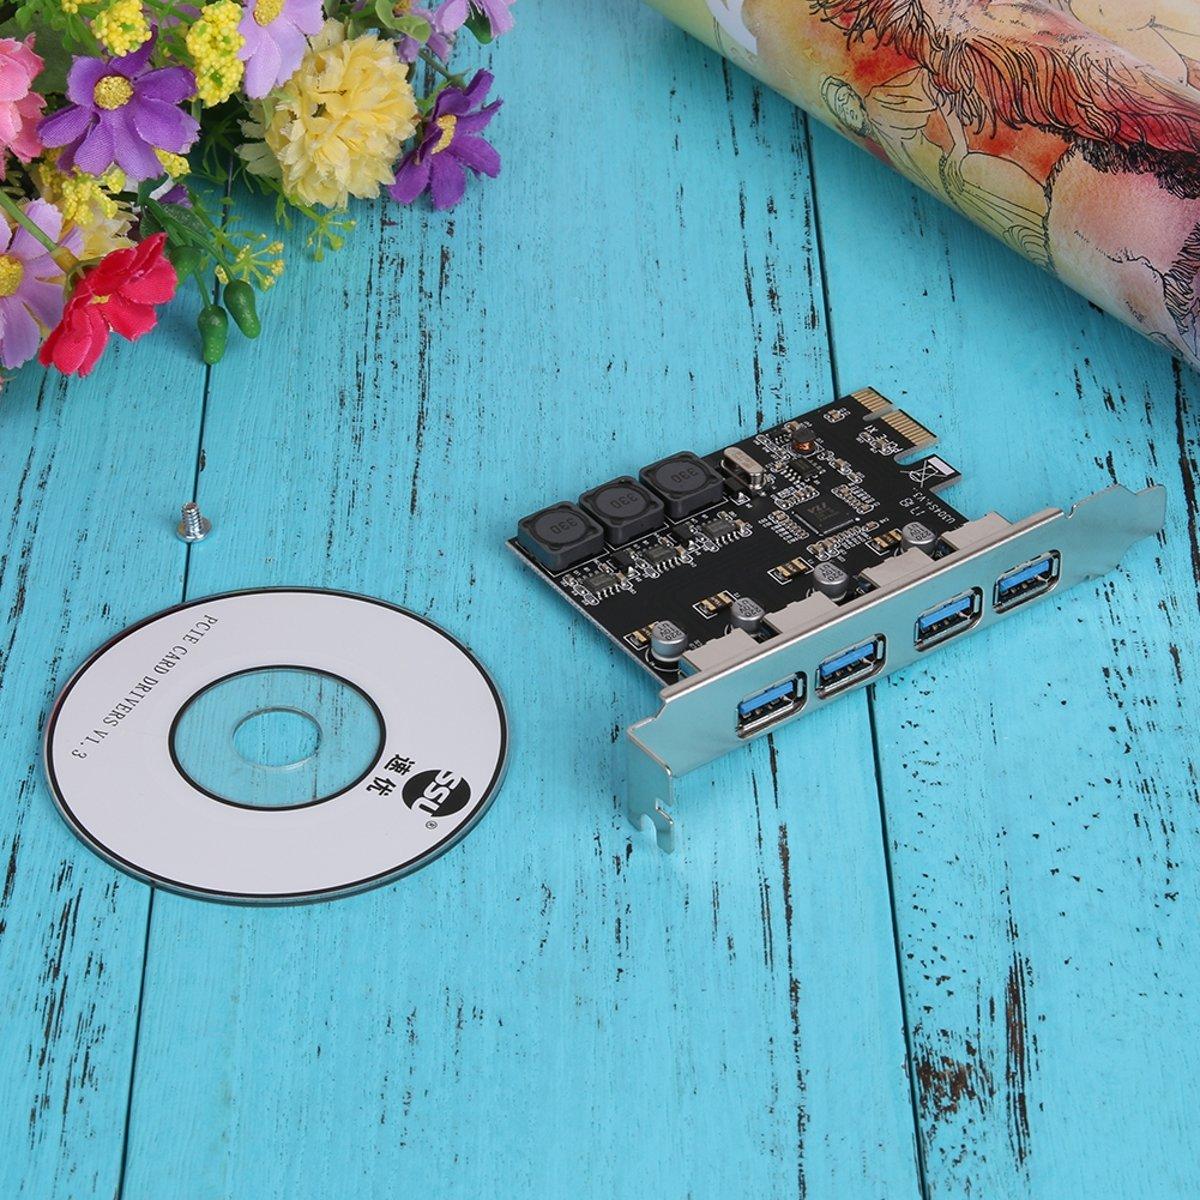 PCI Express 4-Poorts USB 3.0 Card - 5Gbps - PCIe Naar USB-A - Interfacekaart Voor Windows 7/8/10 kopen